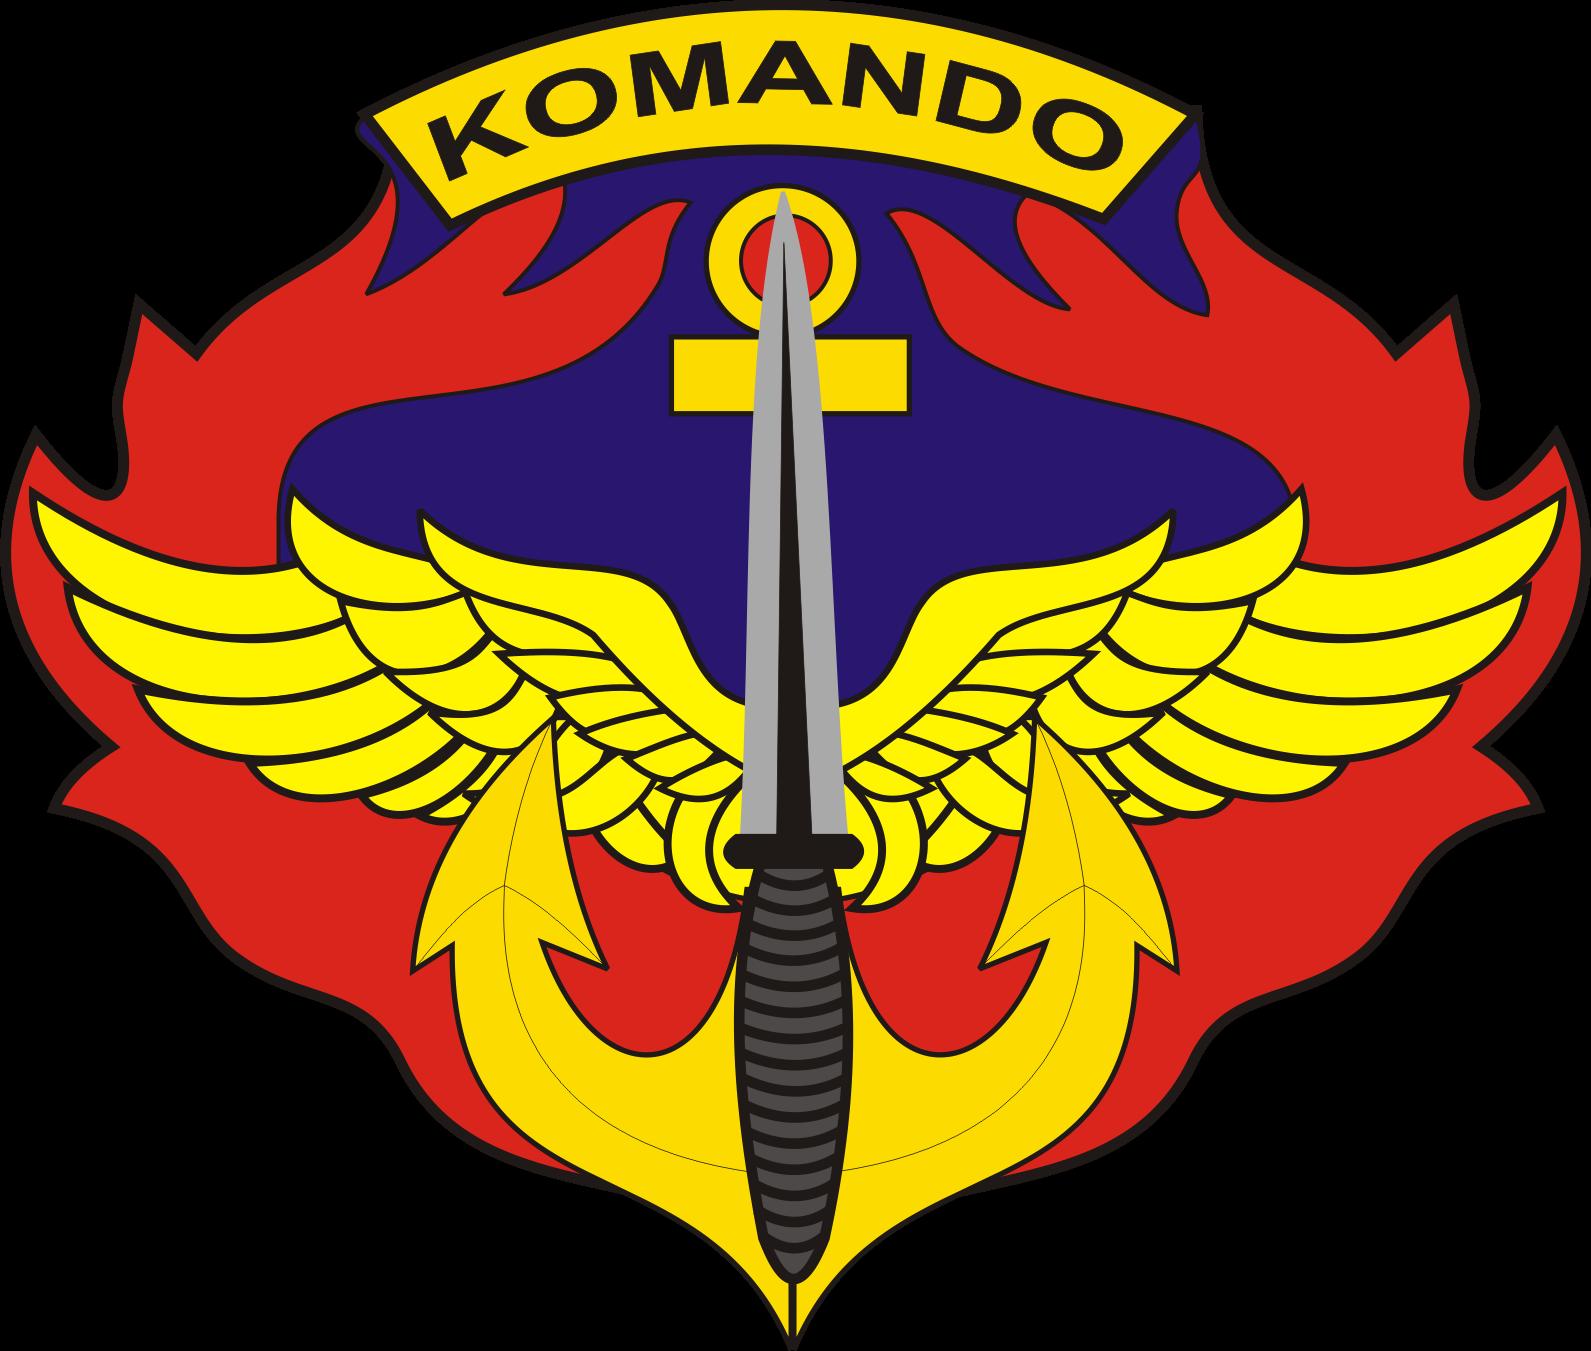 logo vira cakti yudya dan logo komando kumpulan logo